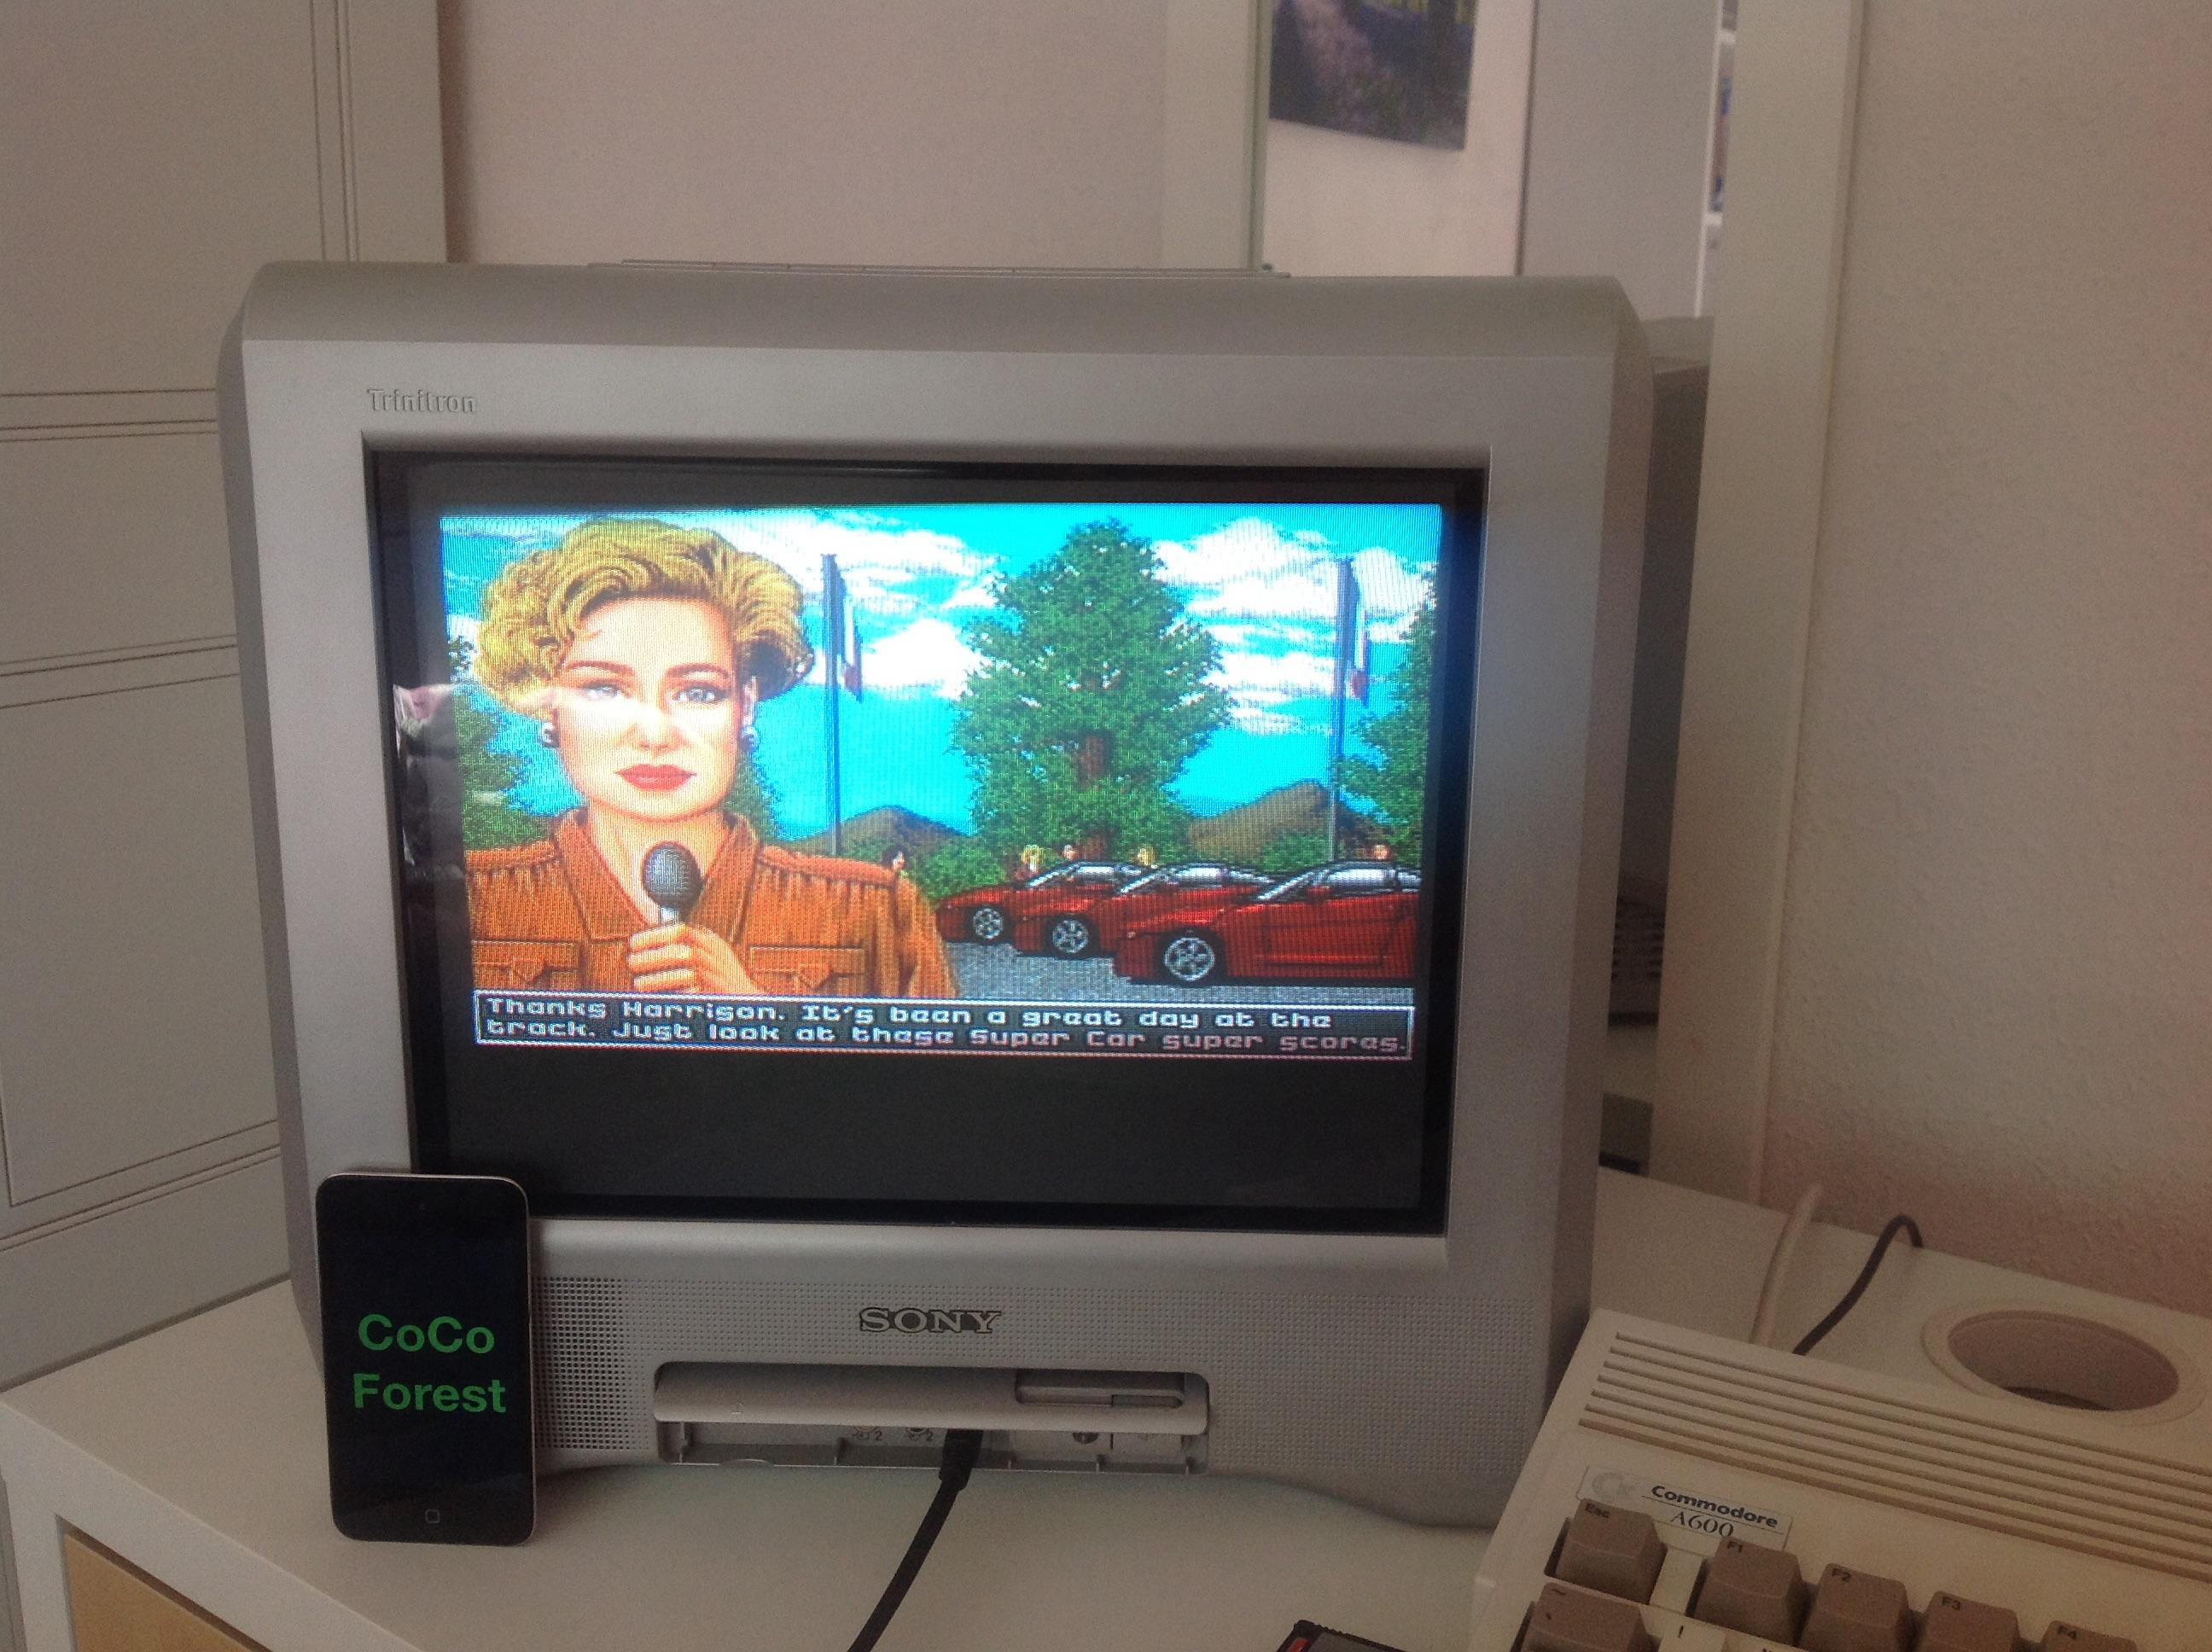 CoCoForest: Super Cars 2 [Medium] (Amiga) 28 points on 2014-10-18 05:06:10